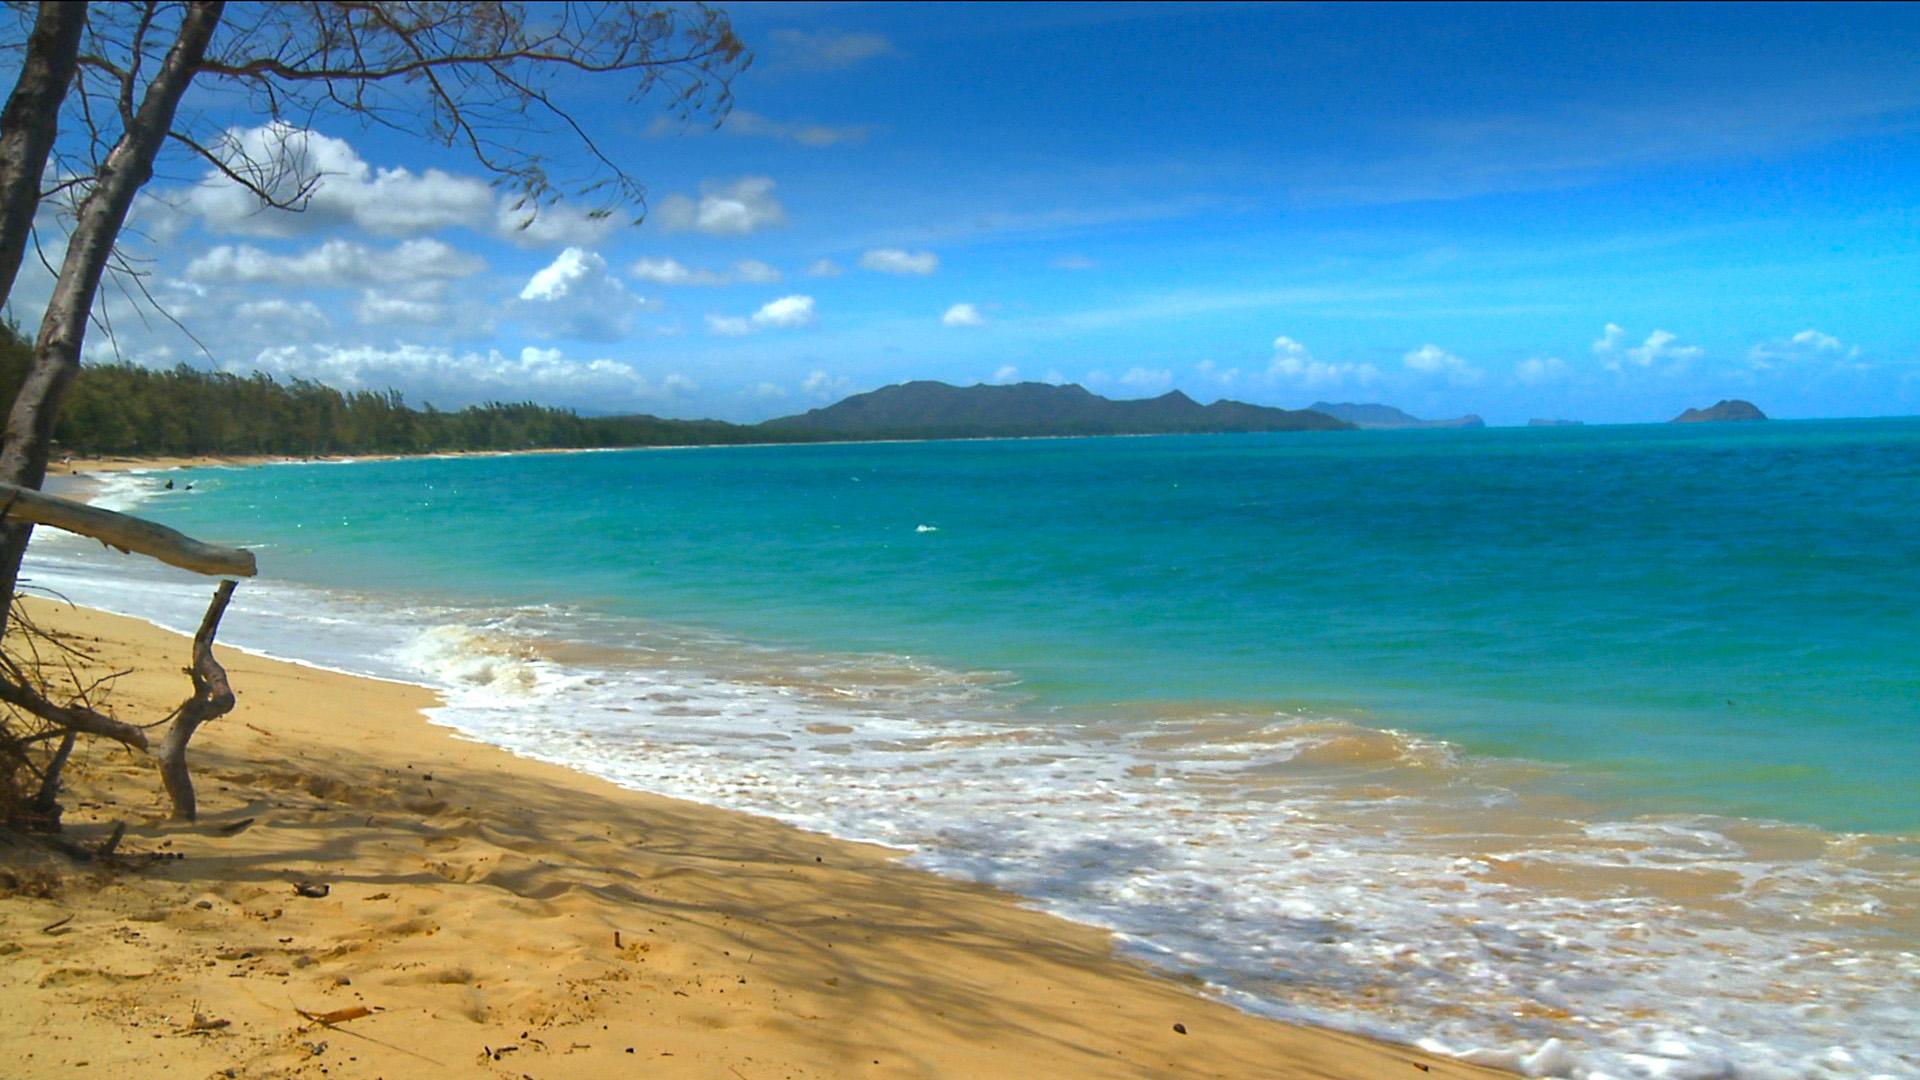 background screensaver beach beaches media webshots beautiful 1920x1080